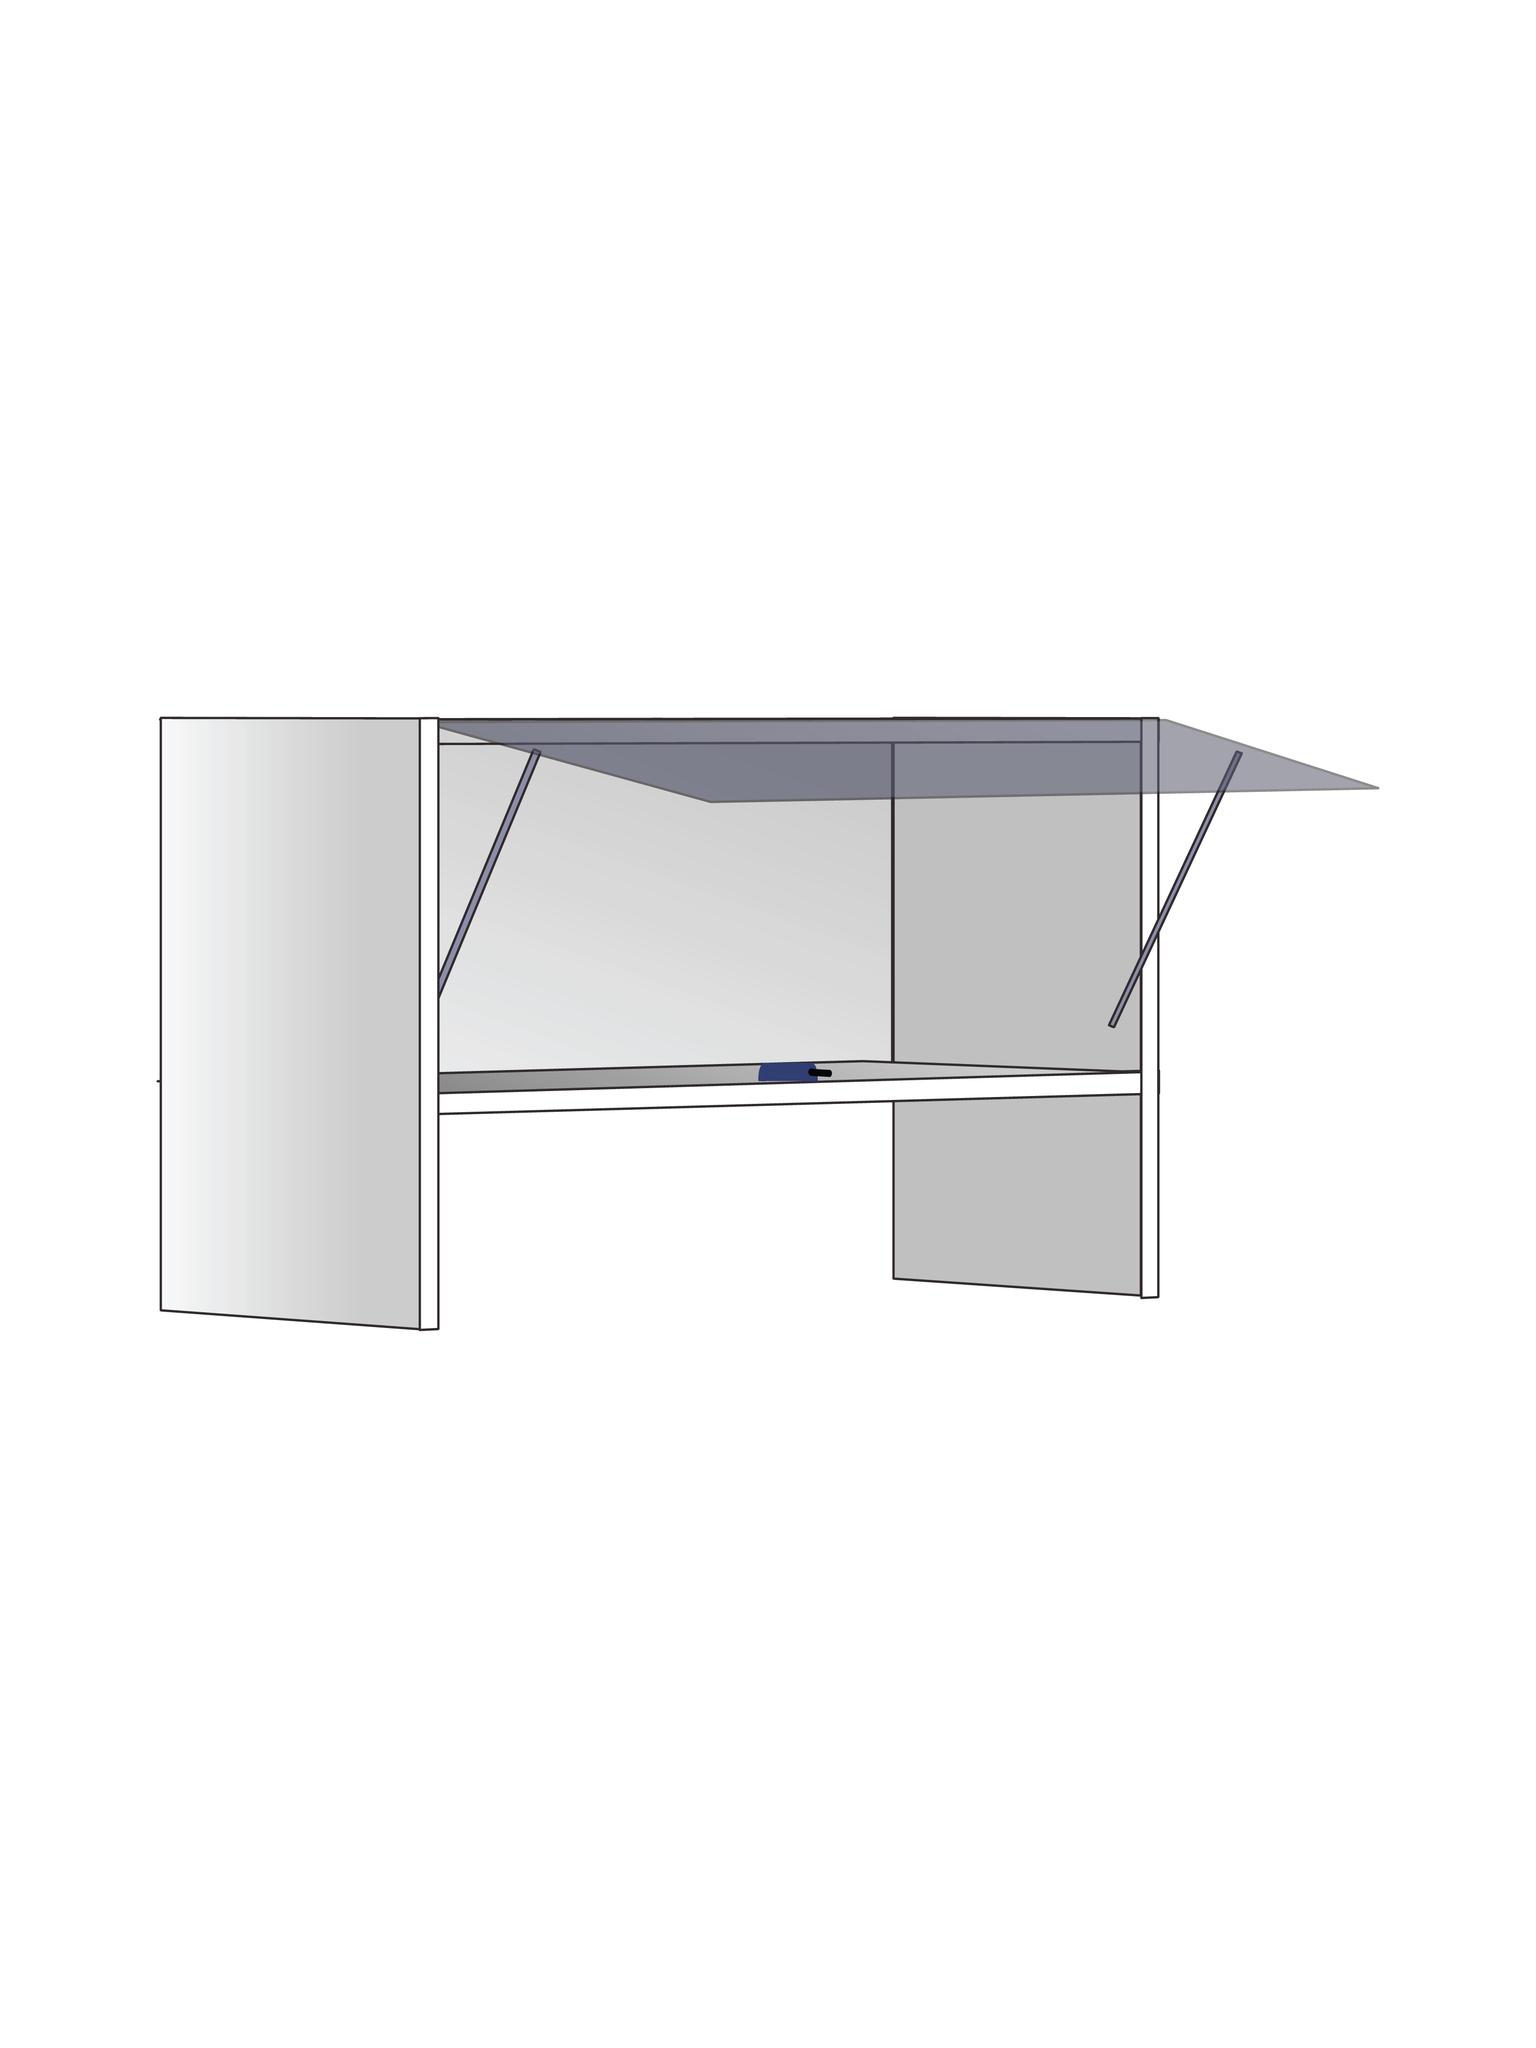 Верхний шкаф для вытяжки , 400Х600 мм / PushToOpen